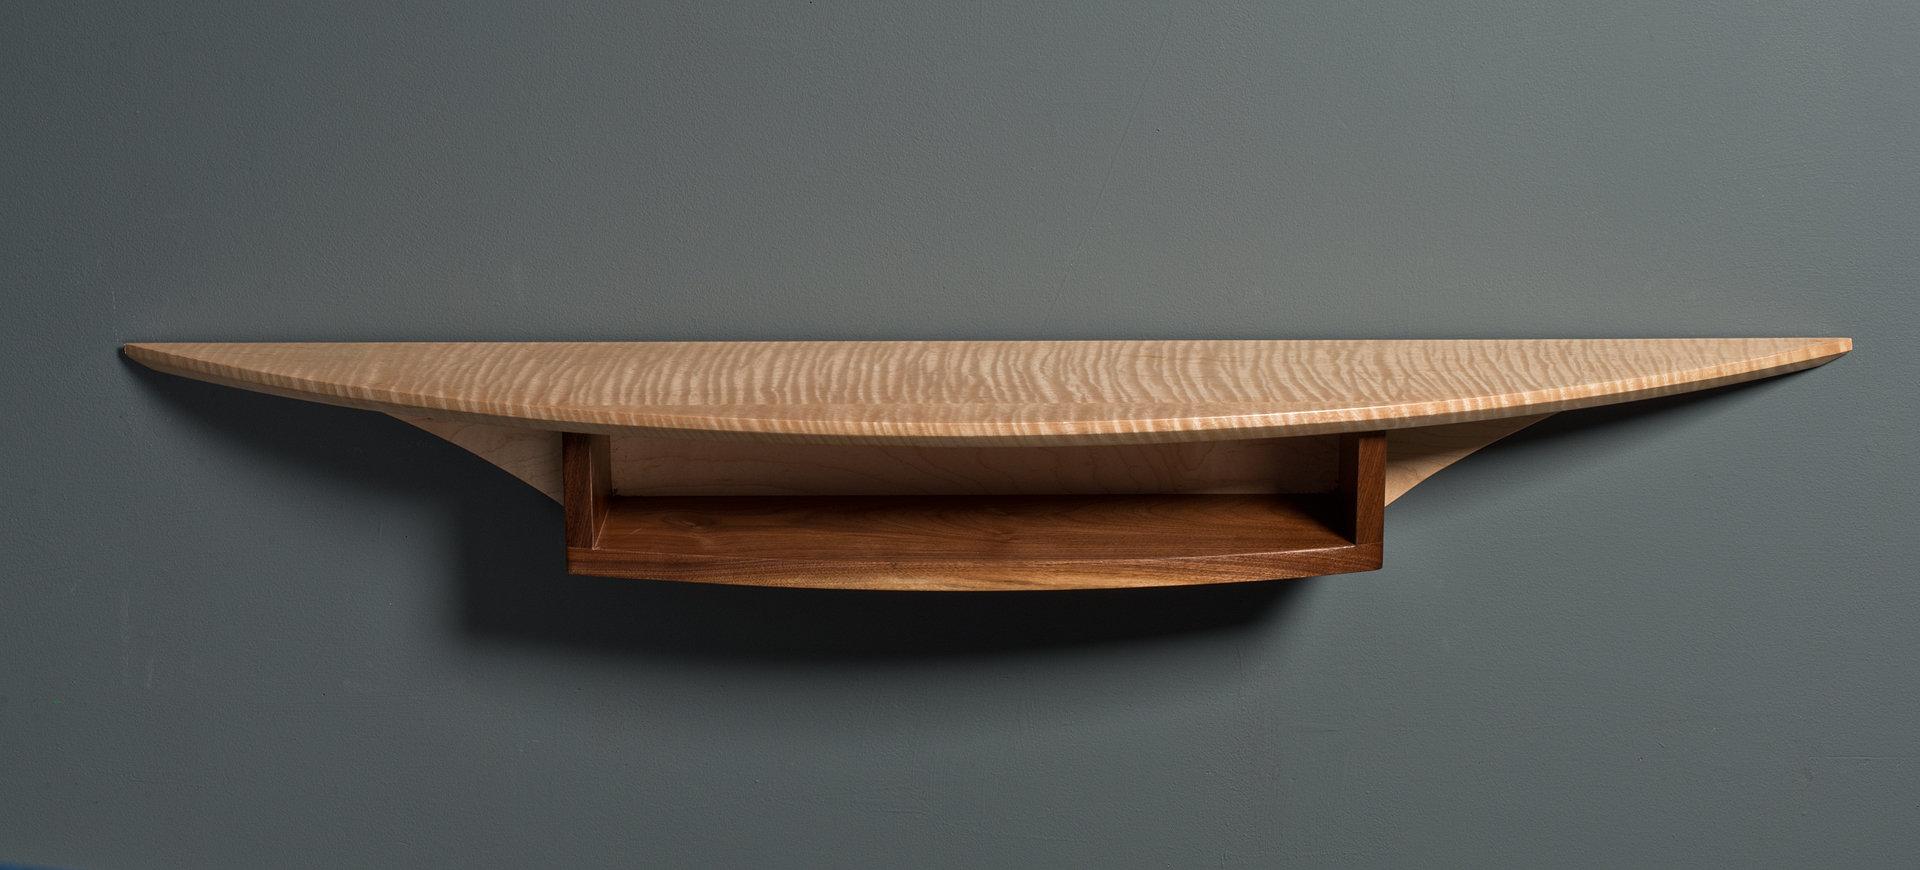 299655f677b6 Demi Lune Wall Shelf by David Kellum. Tiger maple wall shelf with storage  compartment. Hand-applied varnish blend.